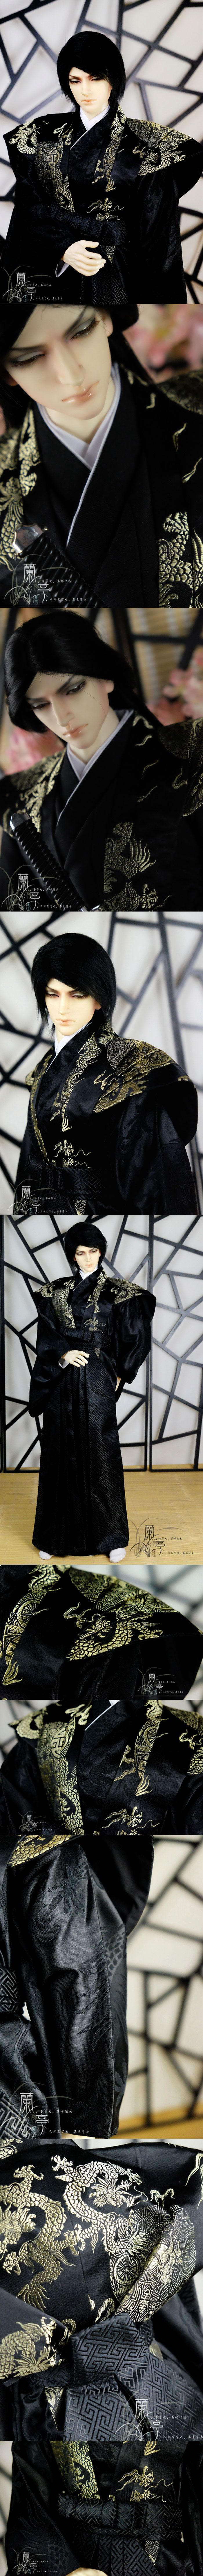 BJD Clothes Boy/Male Kimono [Qingcang] for 80cm/75cm/70cm/SD Ball-jointed Doll_CLOTHING_Ball Jointed Dolls (BJD) company-Legenddoll